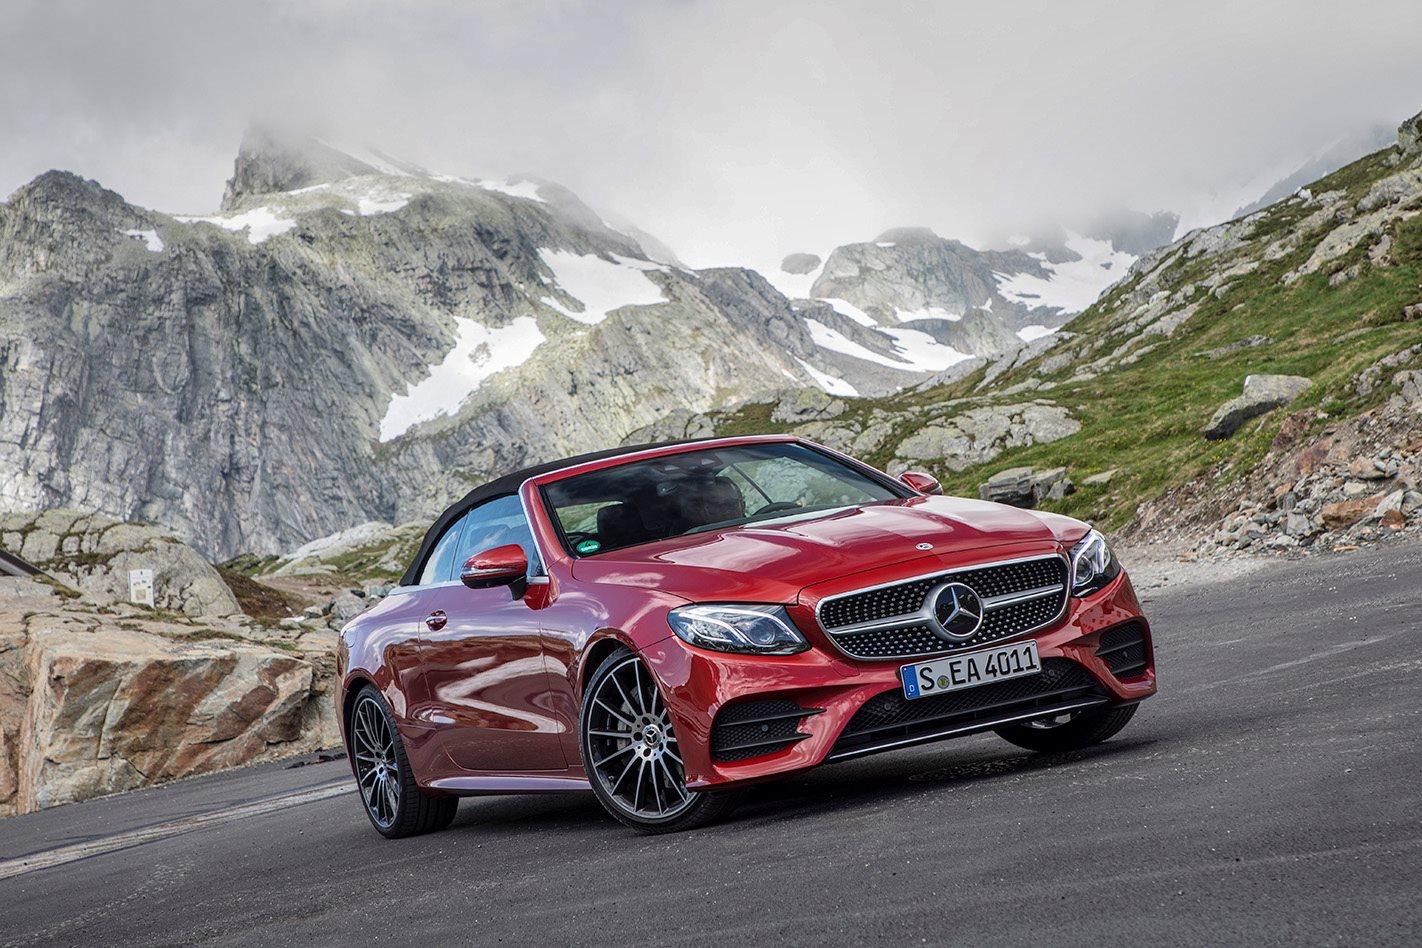 2018 mercedes benz e300. Brilliant E300 For 2018 Mercedes Benz E300